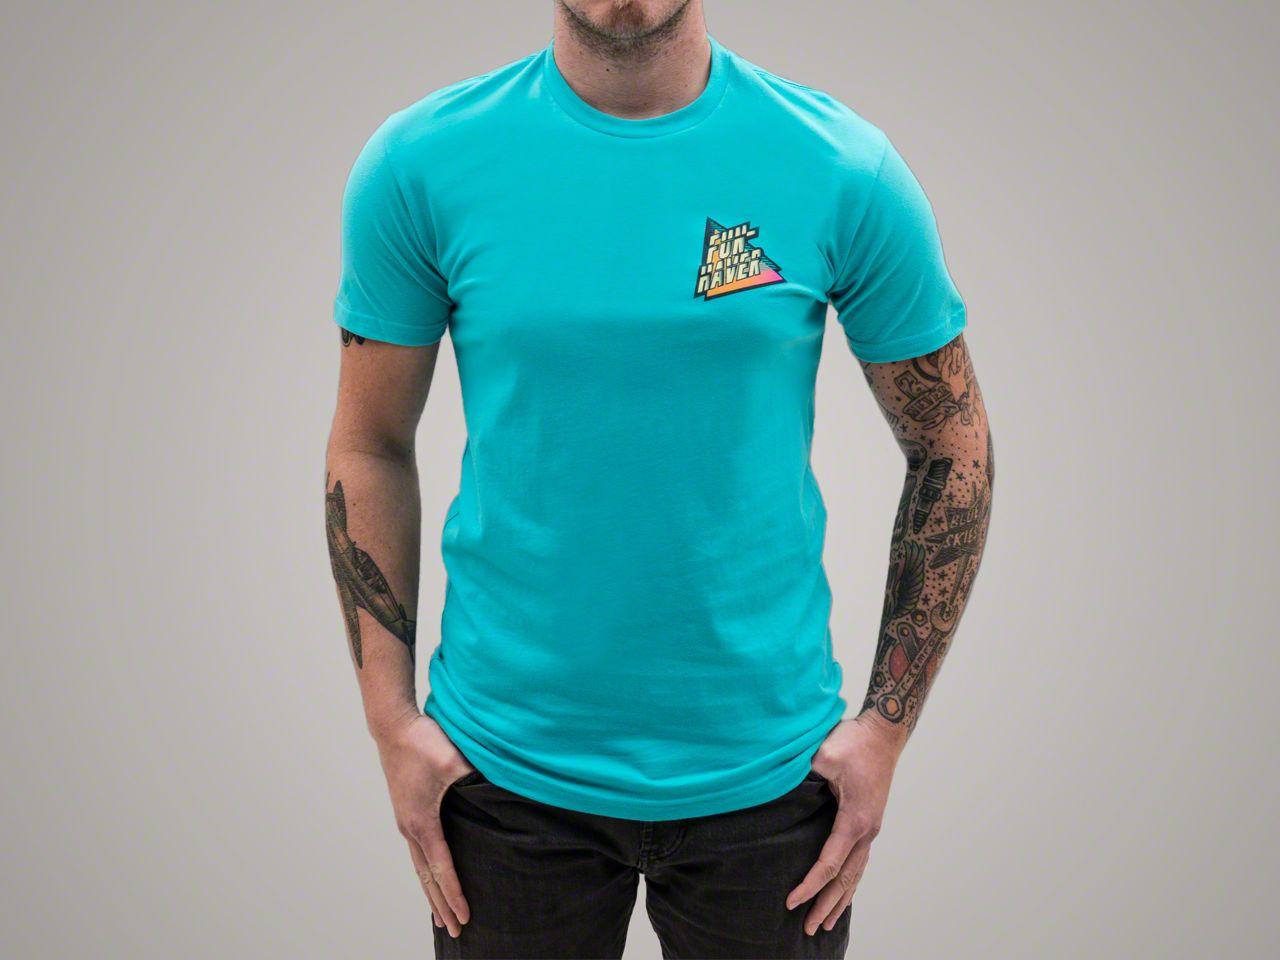 RTR Fun-Haver Summer T-Shirt